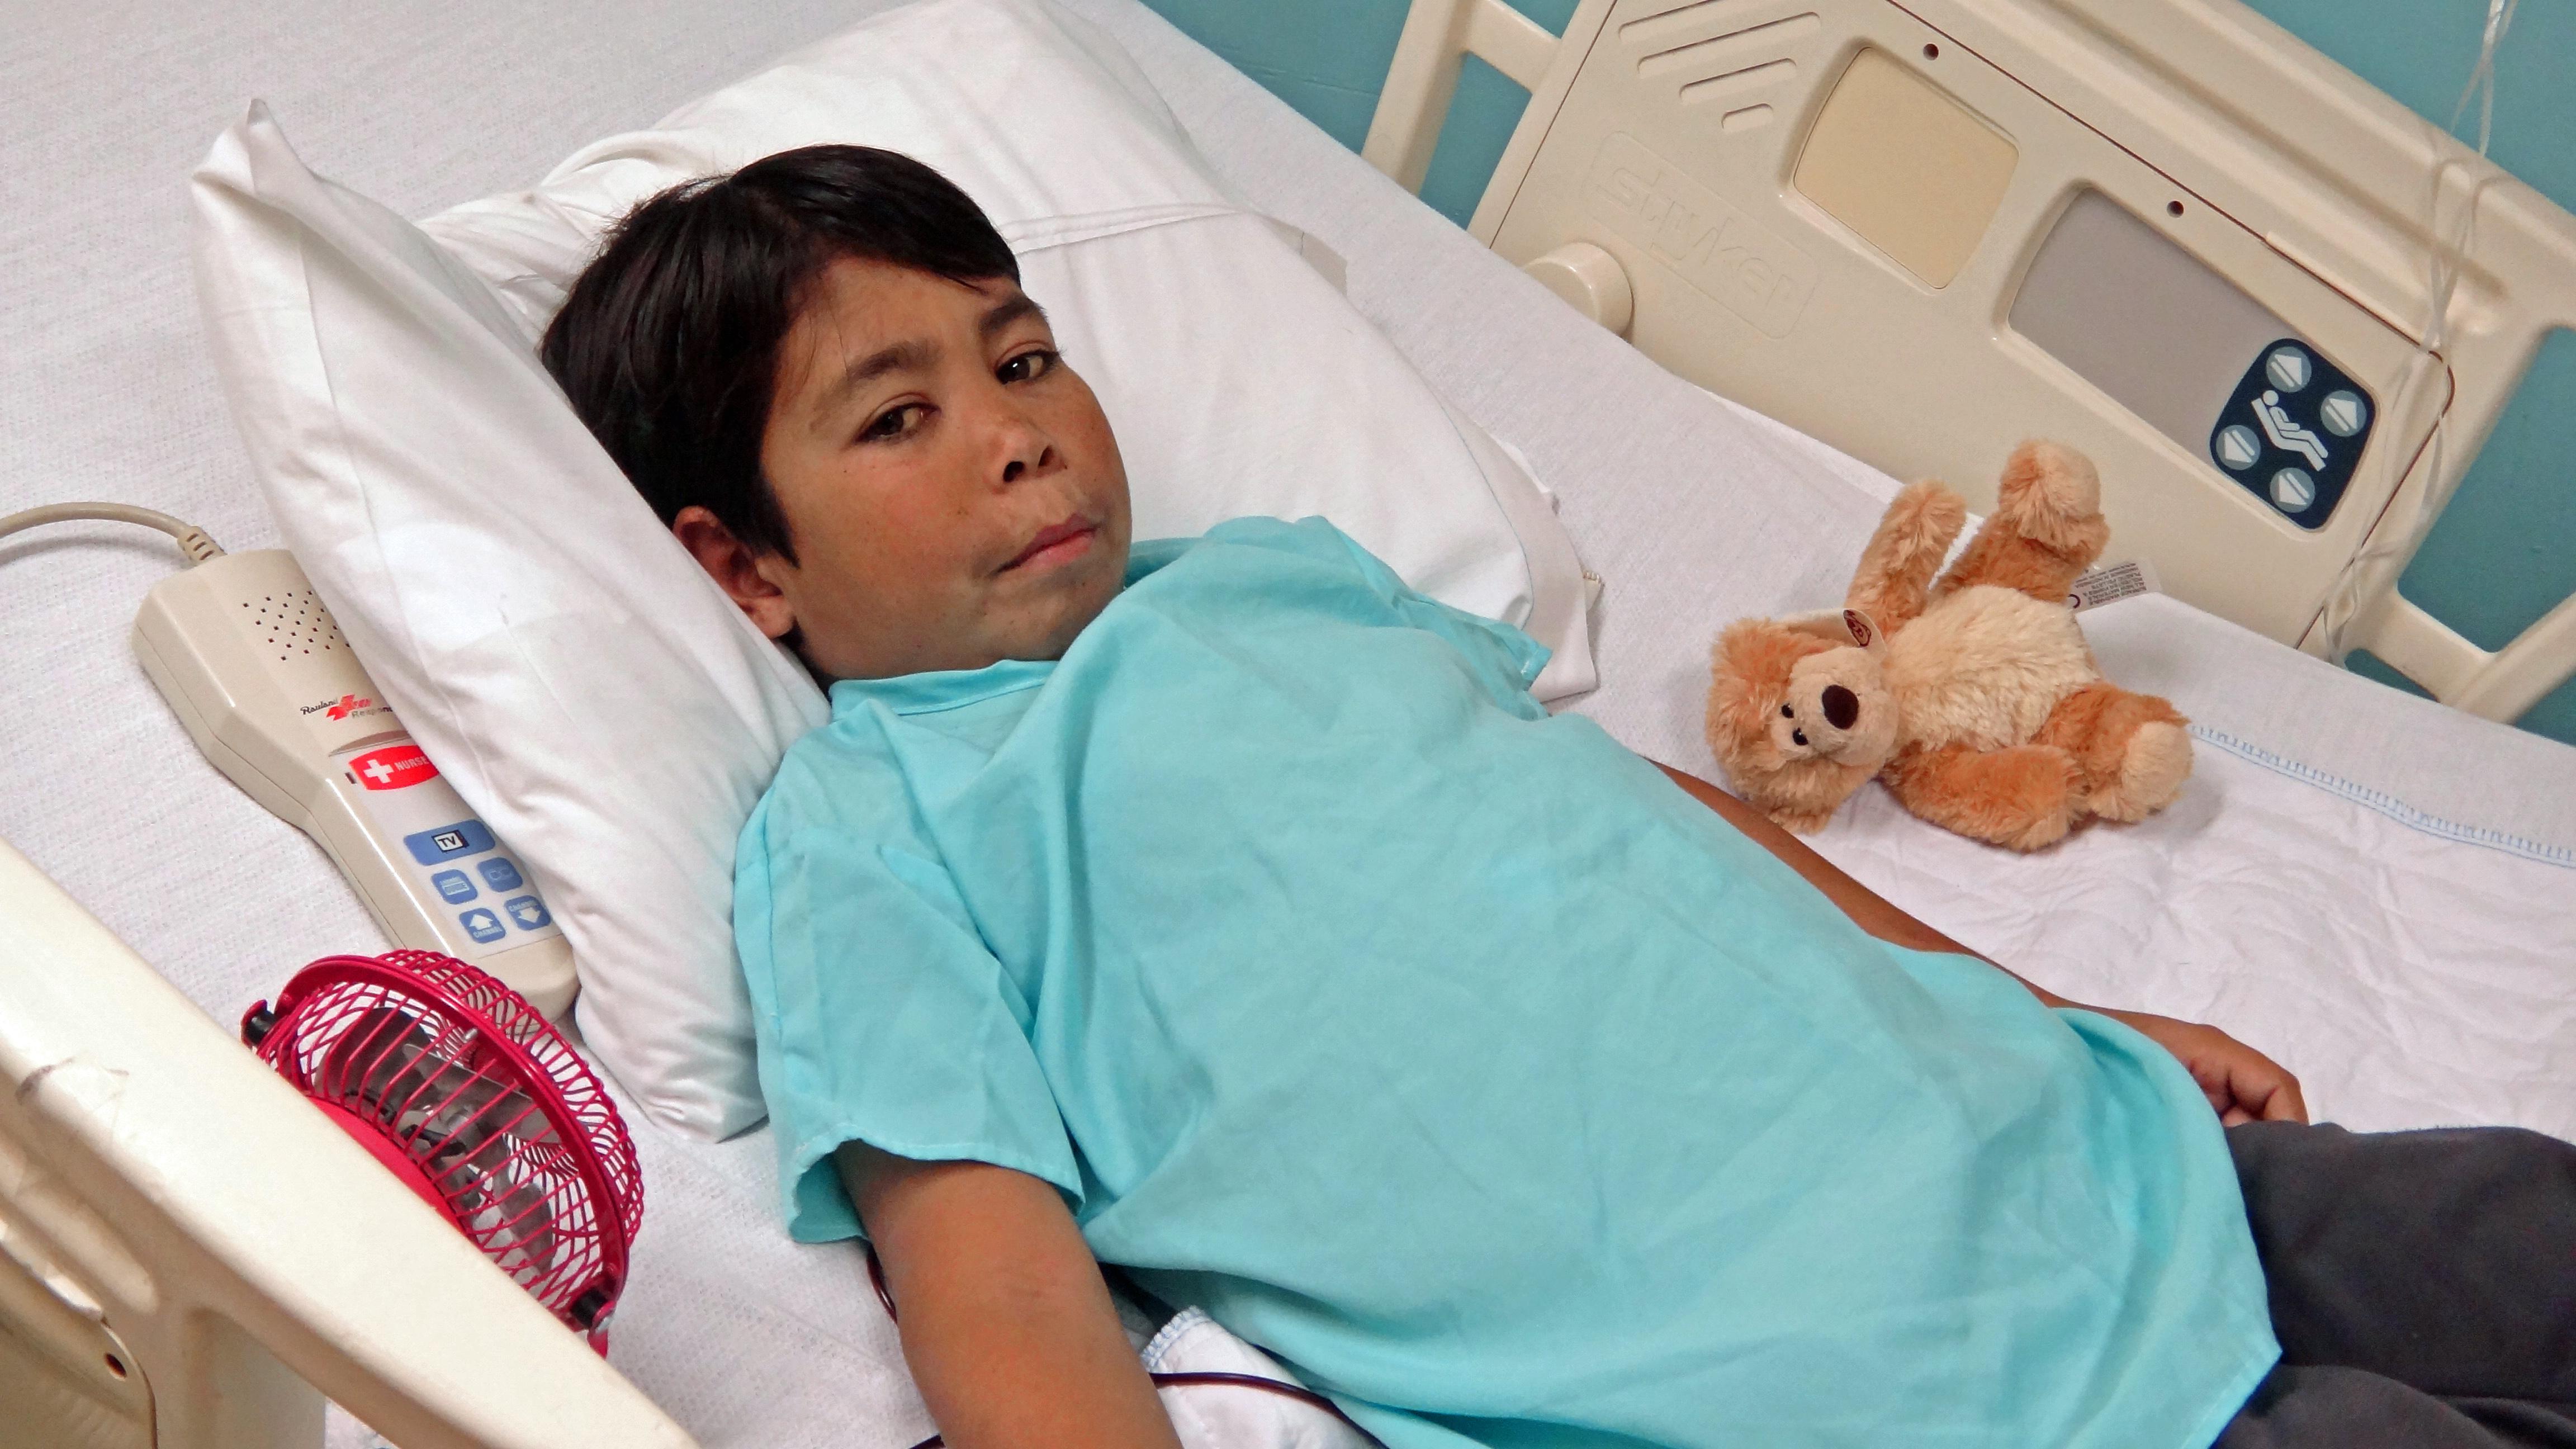 PL Mohammad in Hospital Bed.jpg